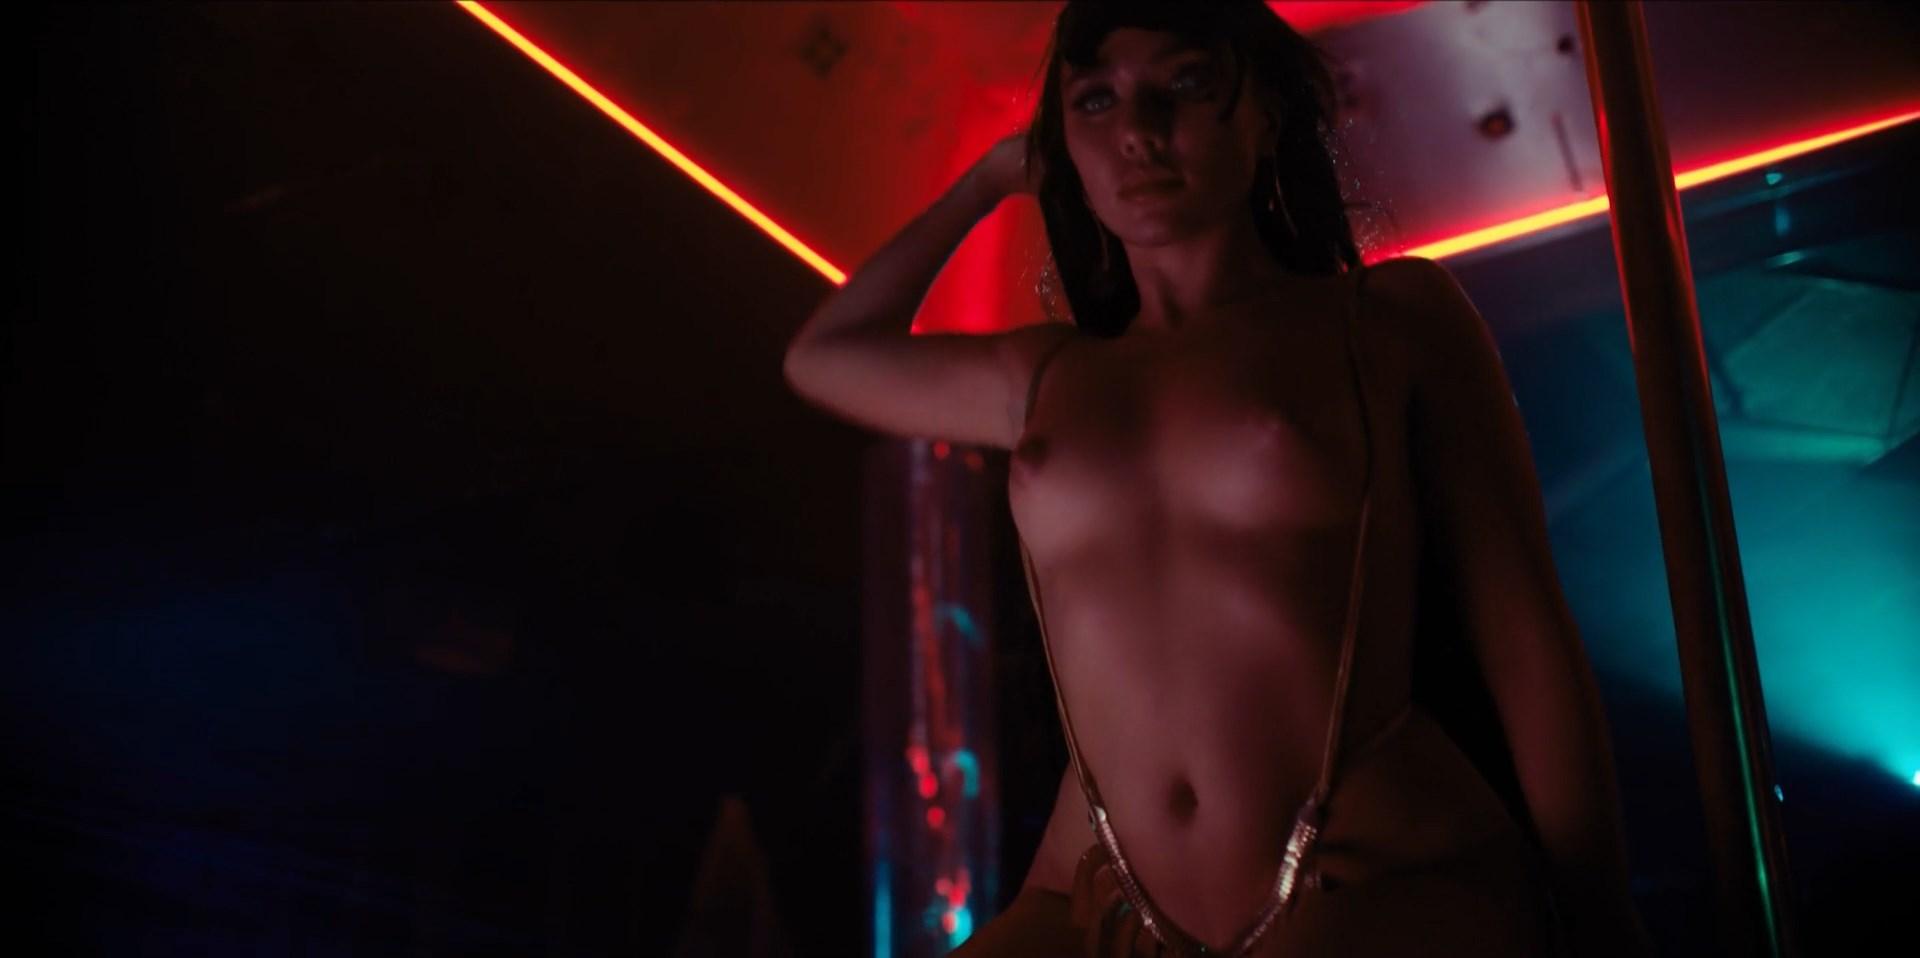 Pornstars and sex